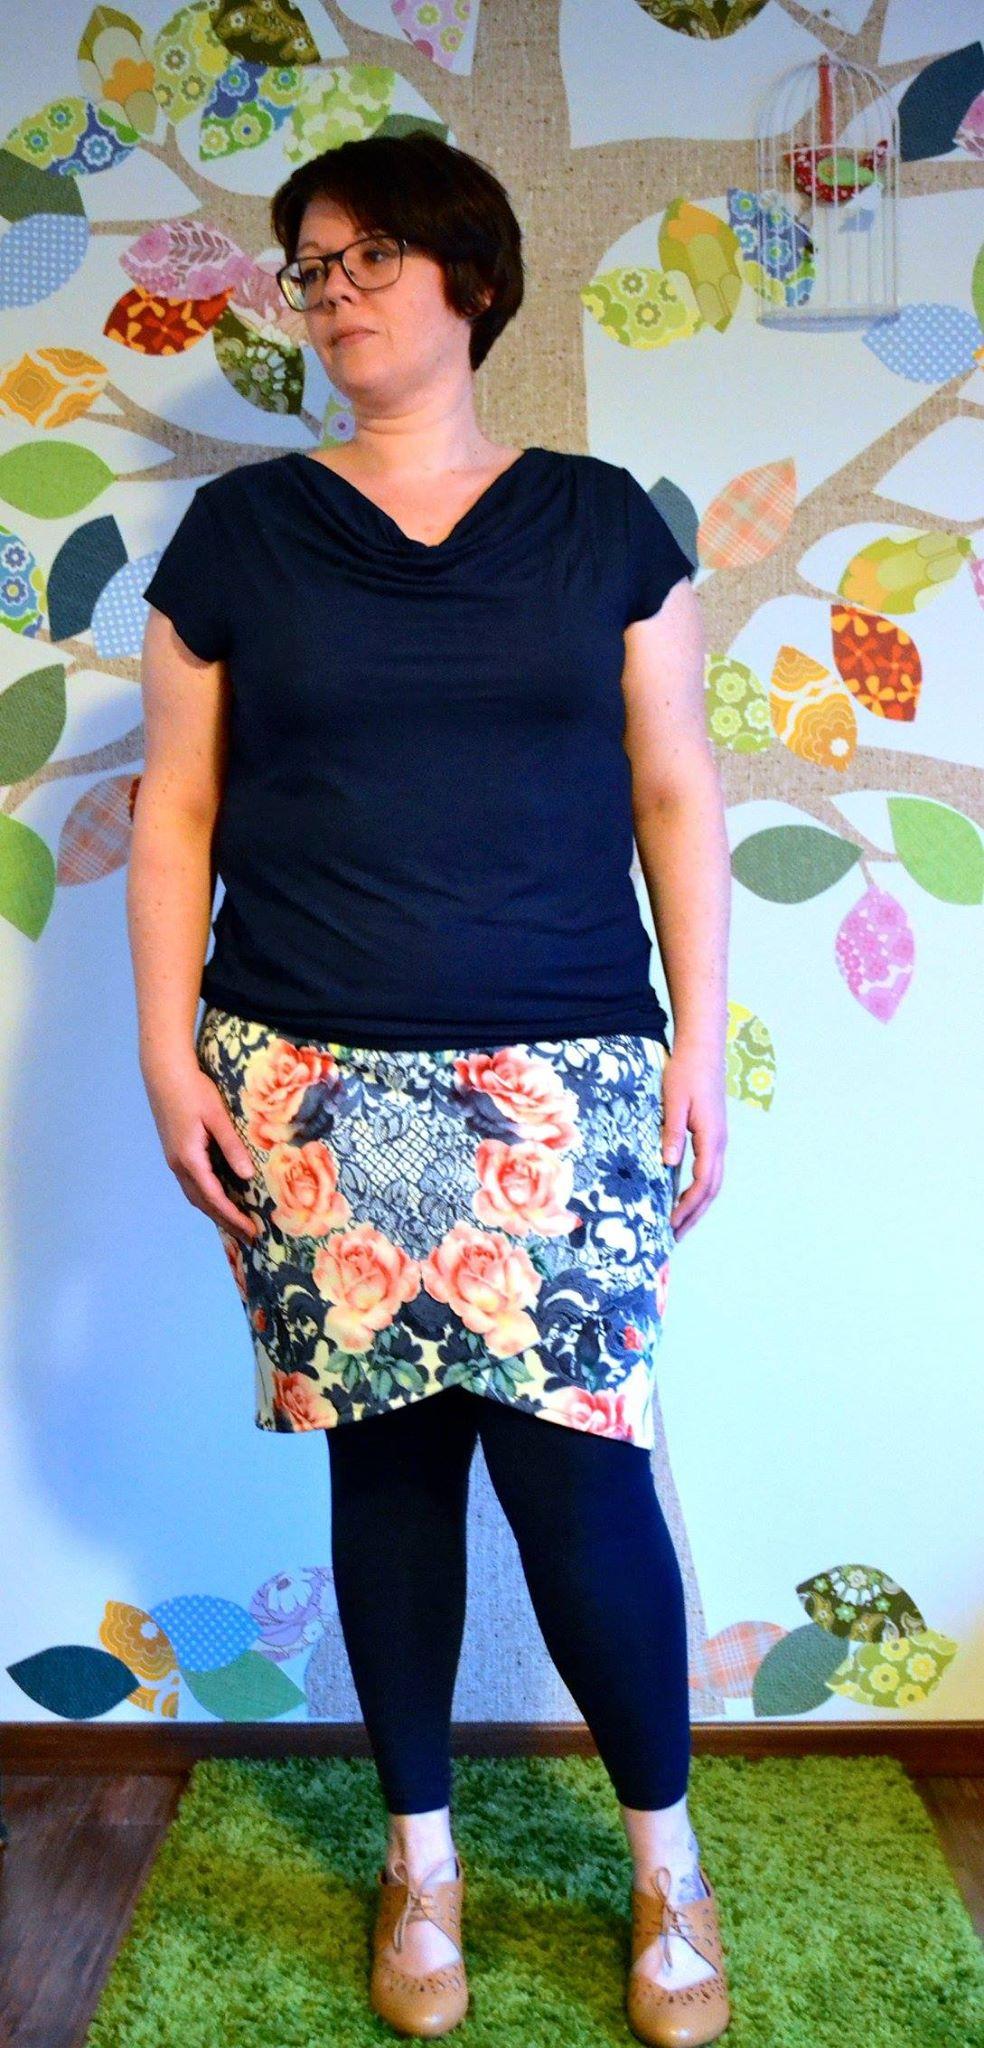 Marie-Paule's Lindy Petal Skirt